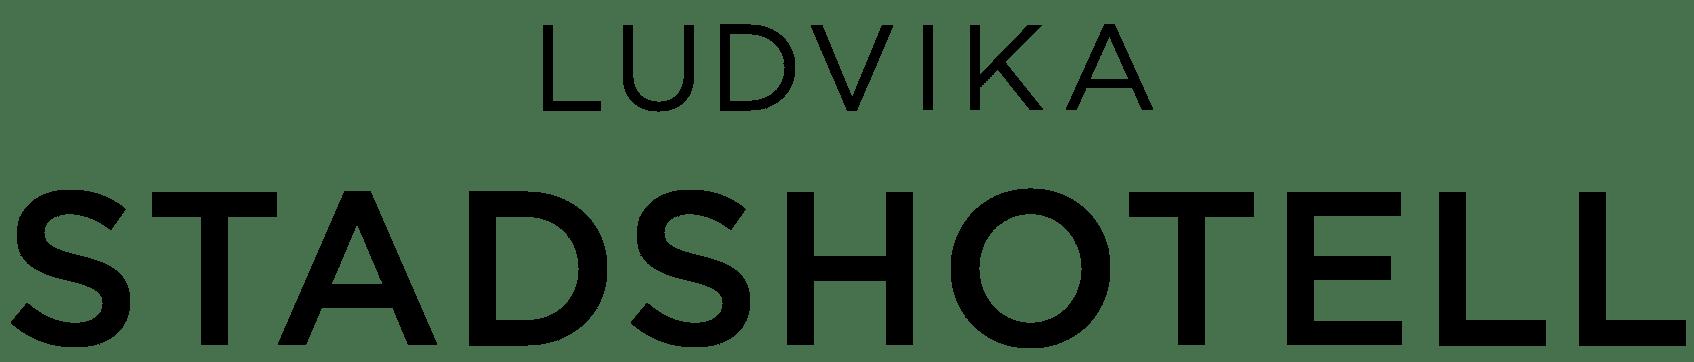 Ludvika stadshotell logotype